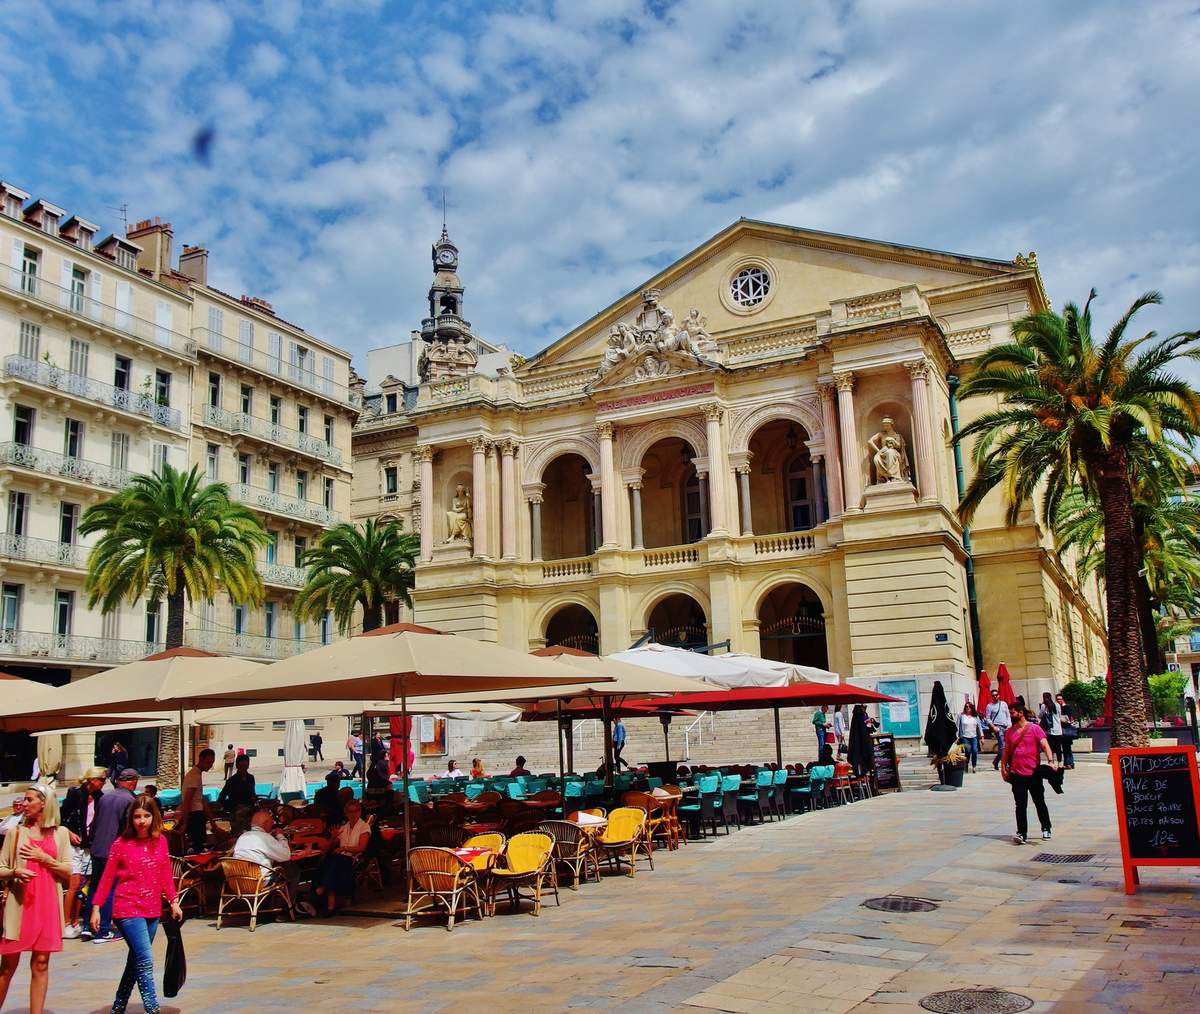 Place Victor Hugo - copyright mycottoncloud